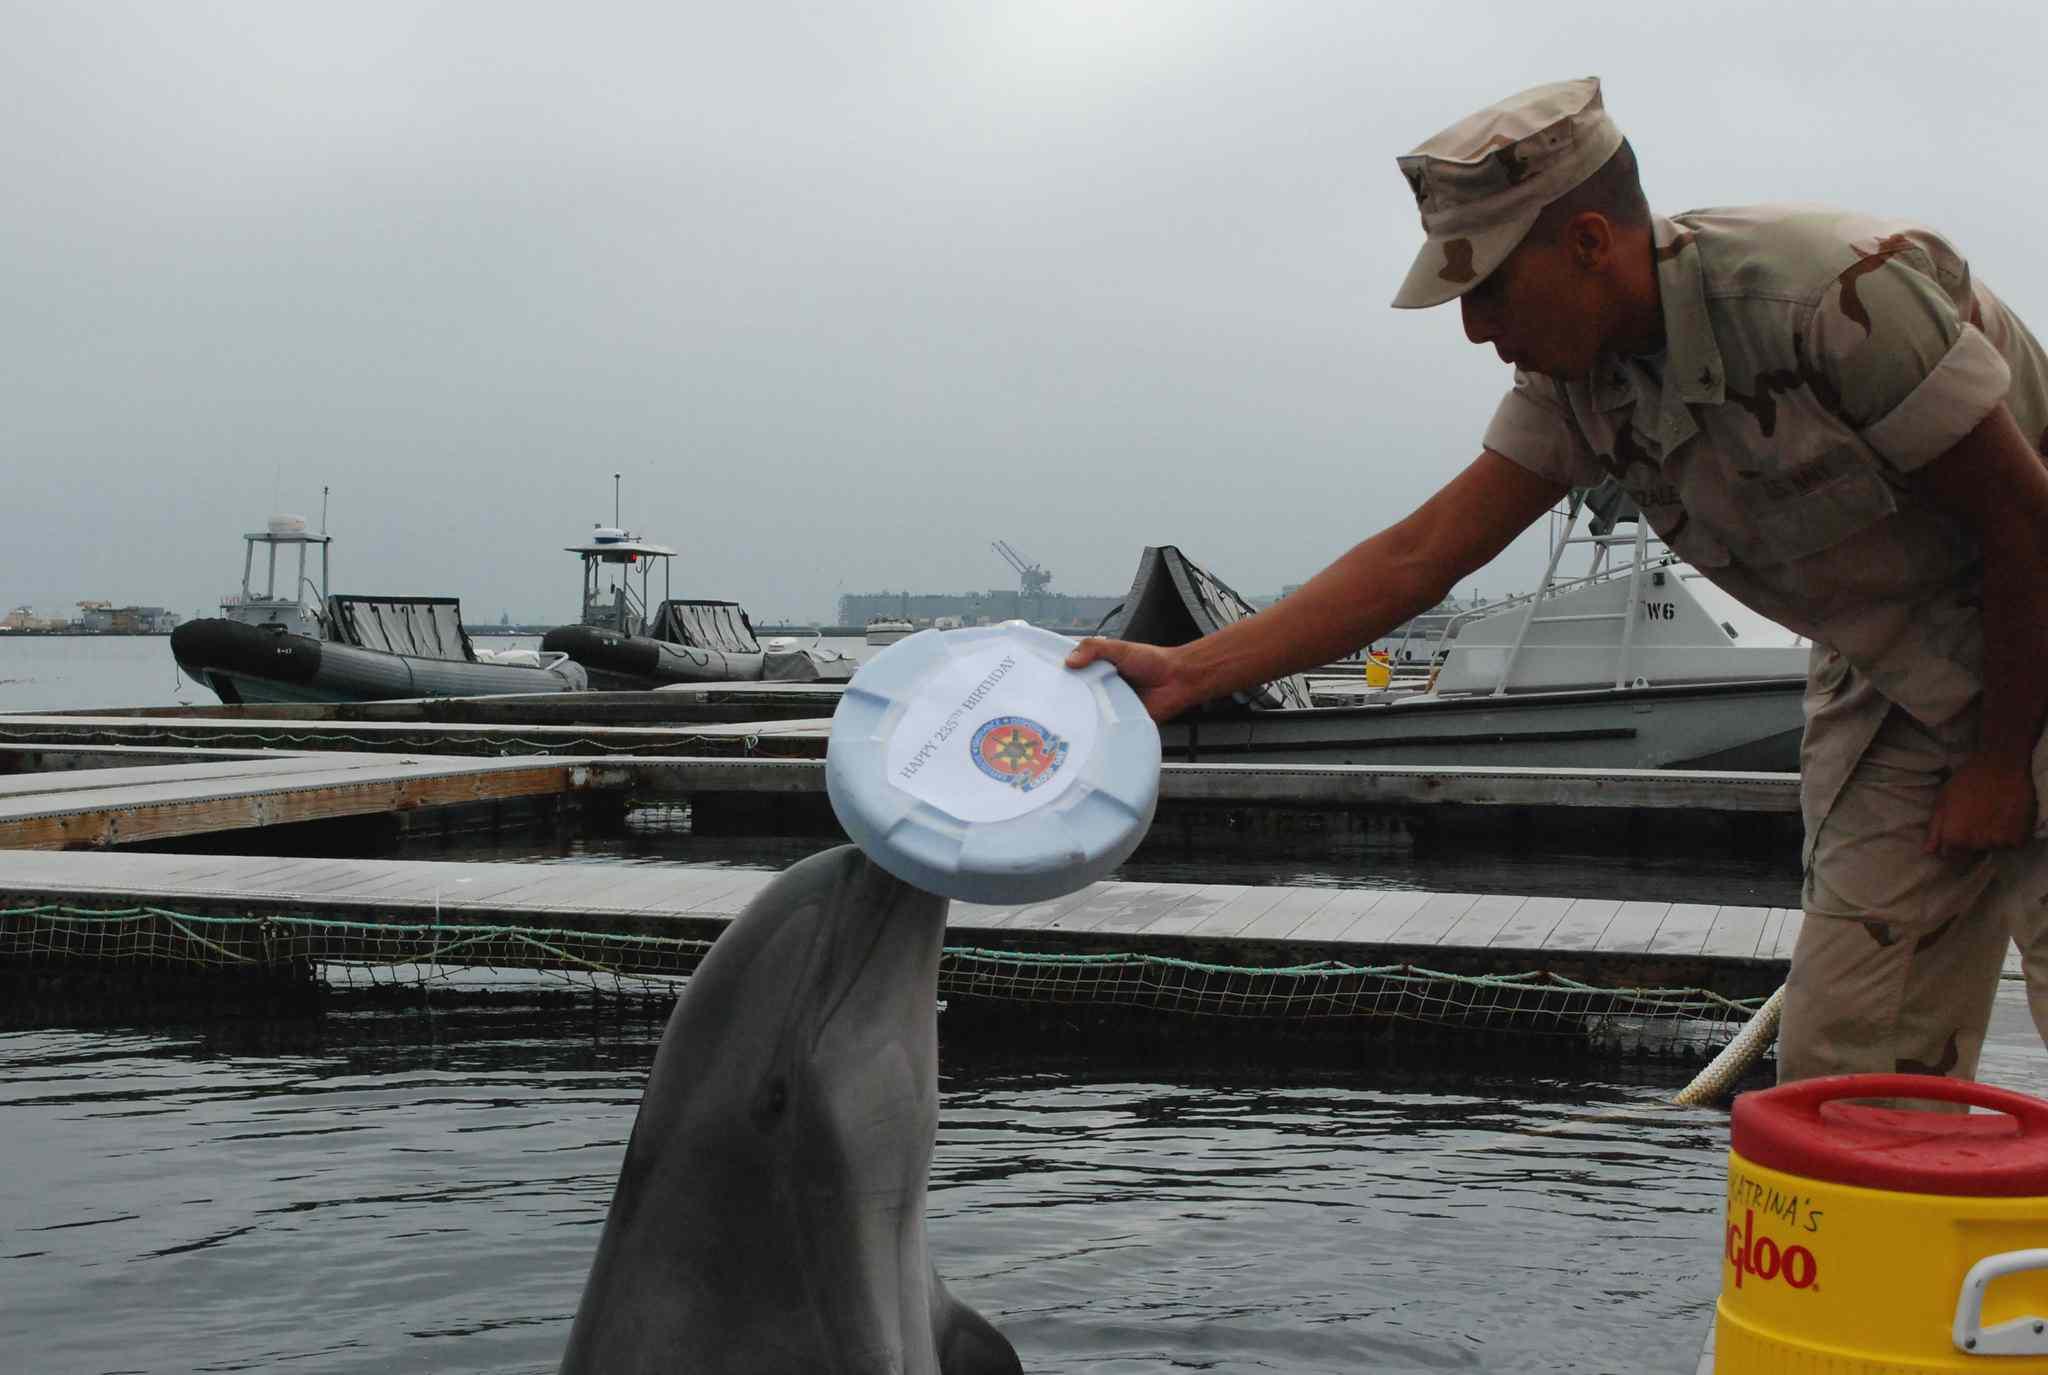 marine mammal handler training dolphin with white disk